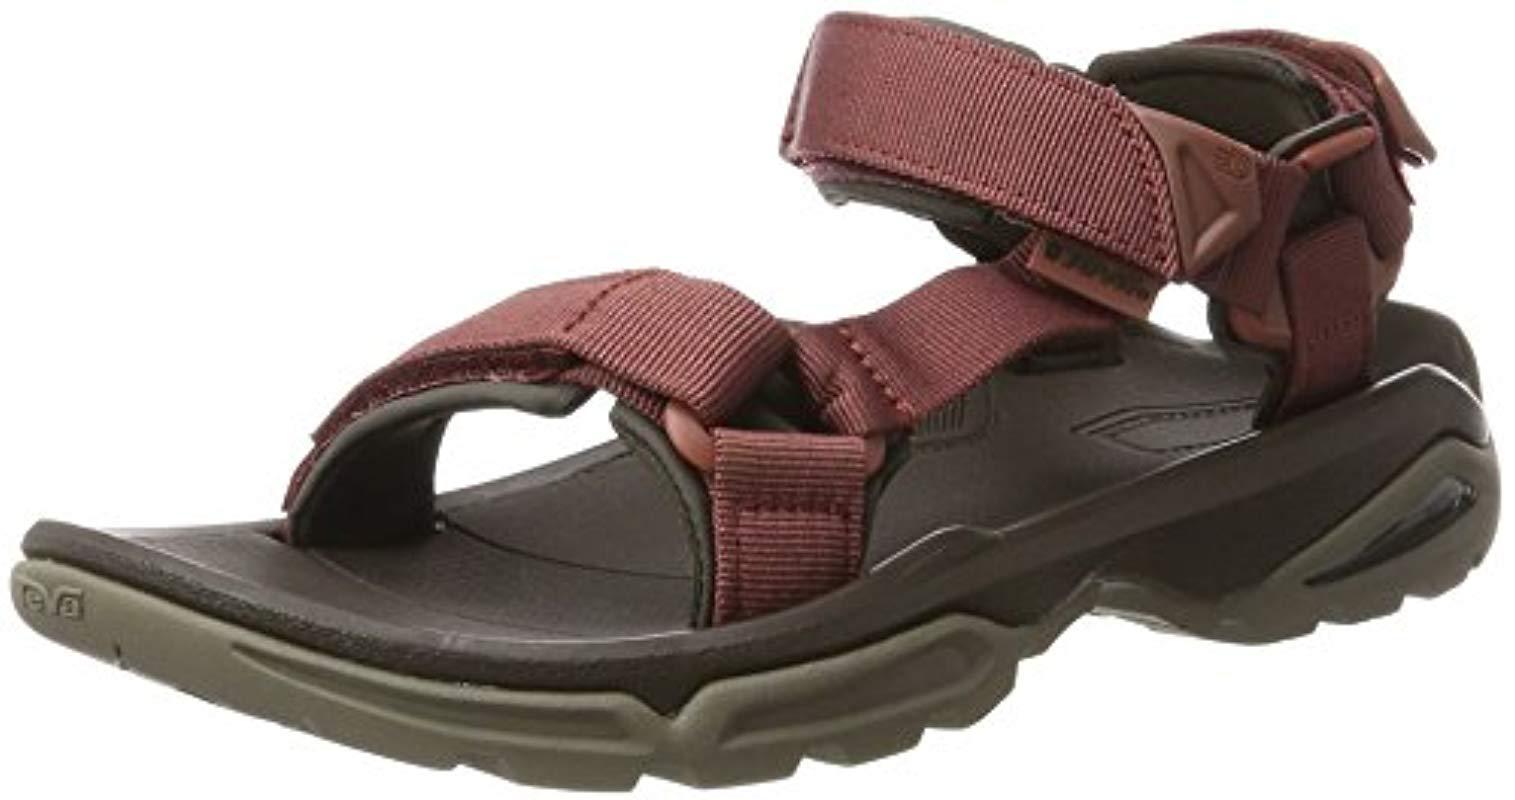 60ab881729fe Teva Terra Fi 4 Sports And Outdoor Hiking Sandal for Men - Lyst